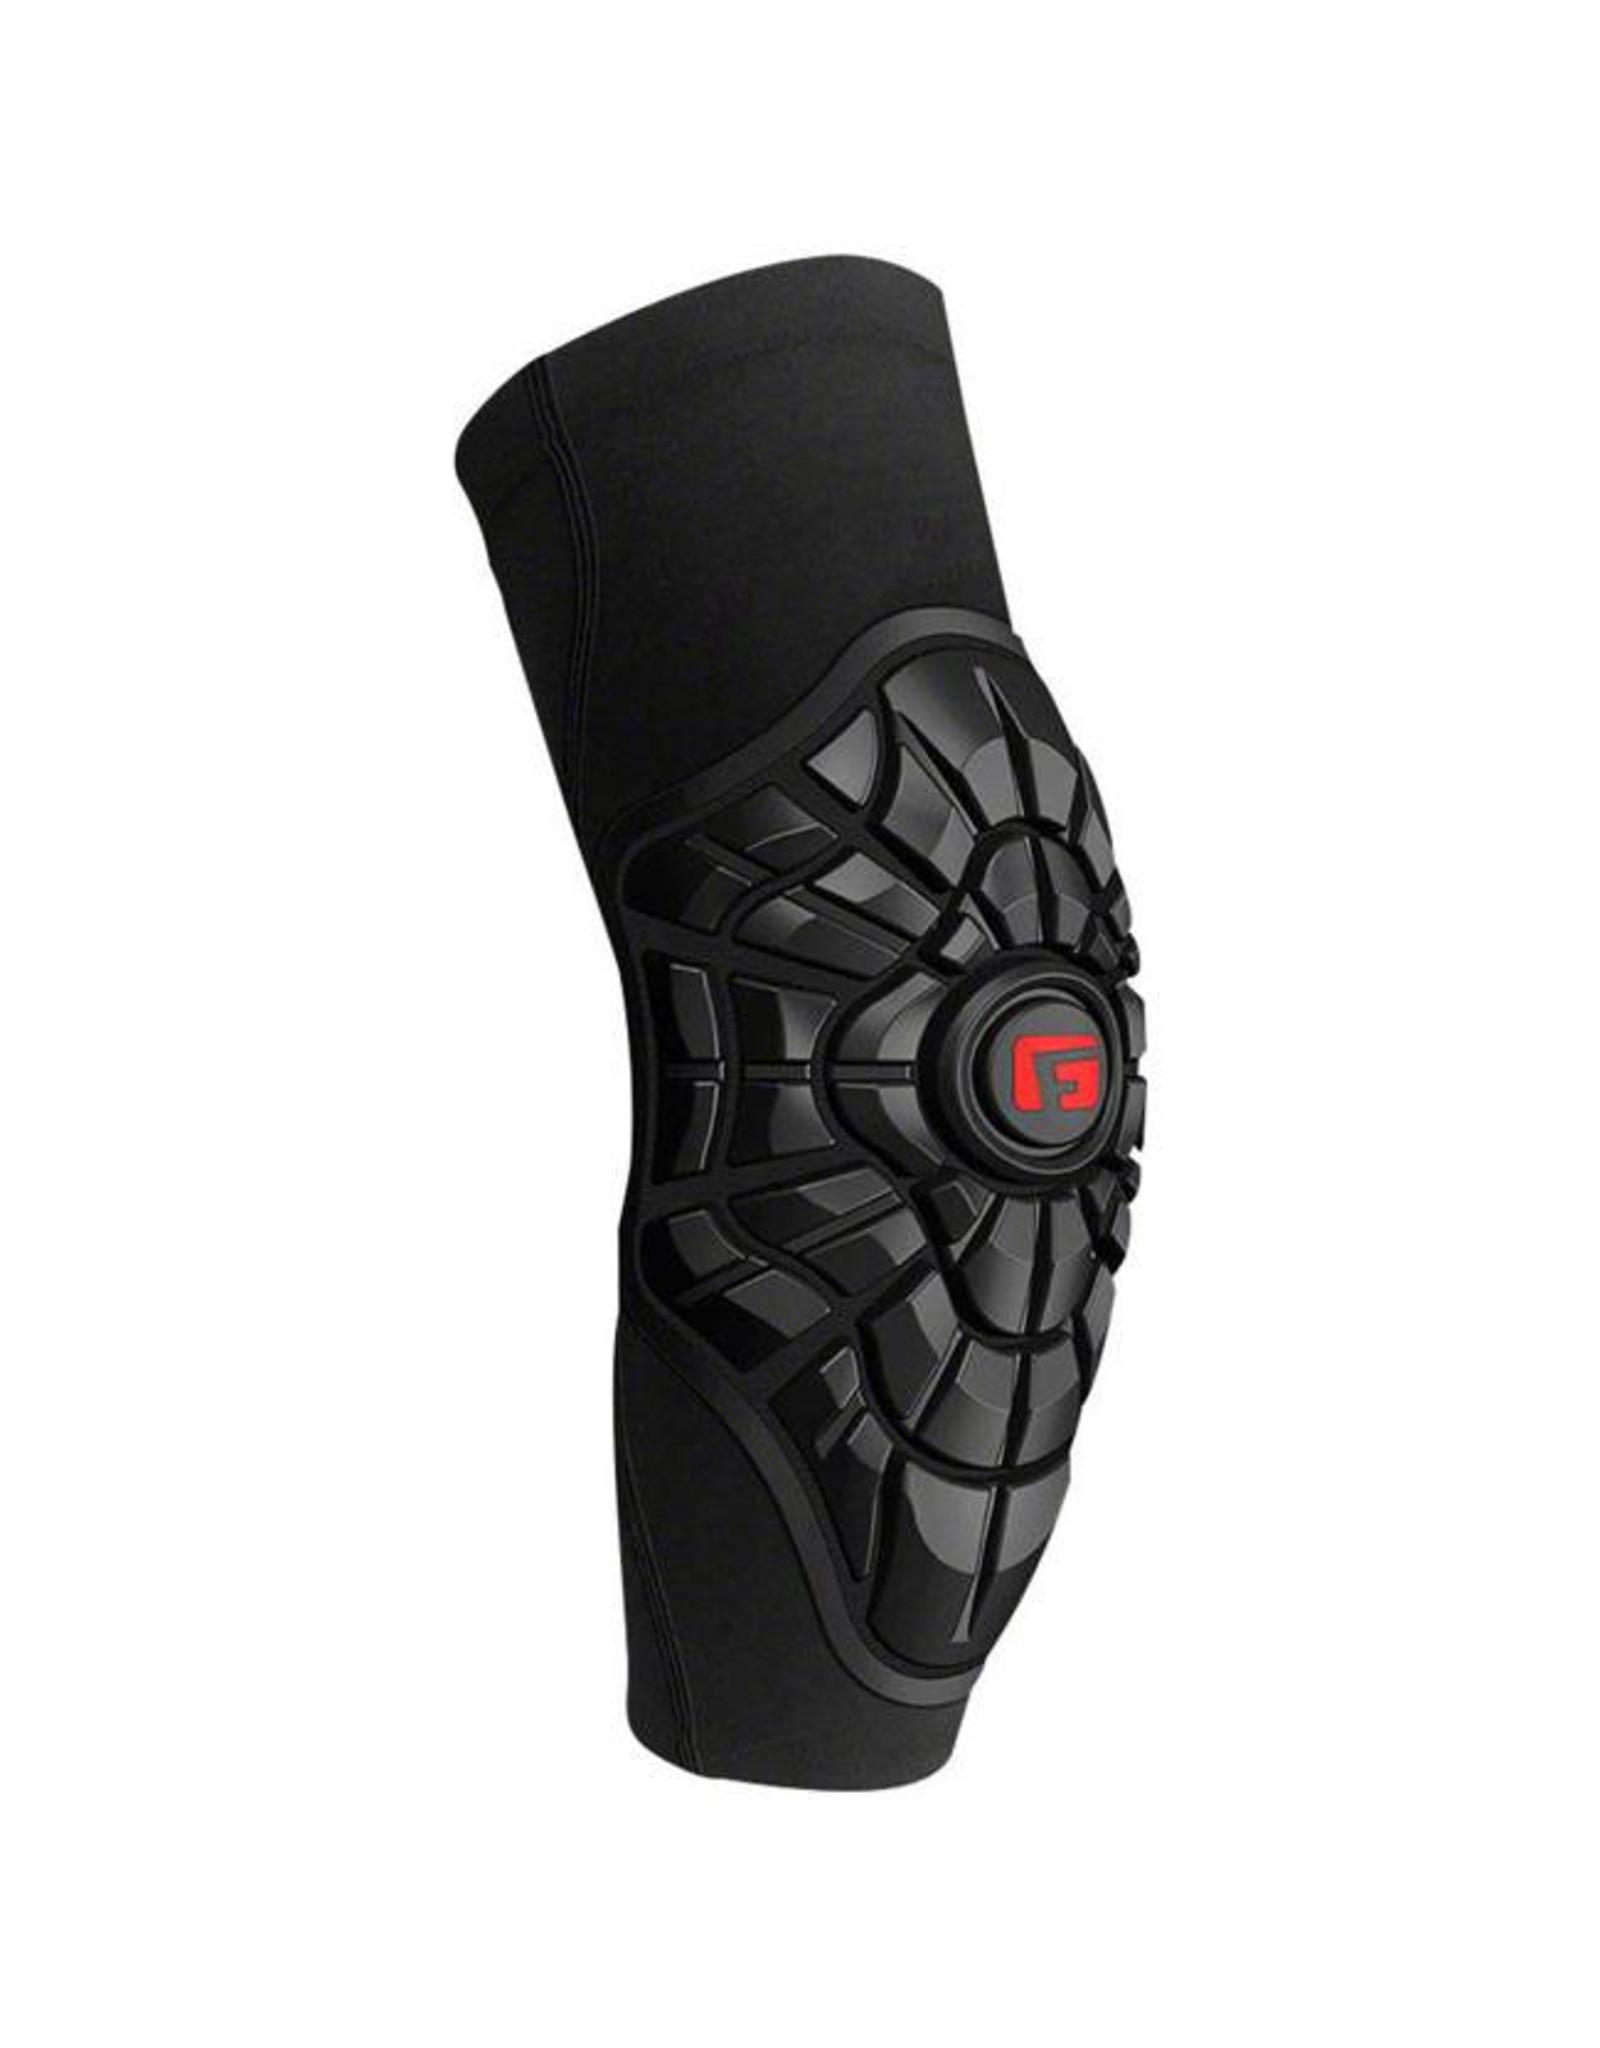 G-Form G-Form Elite Elbow Pad: Black XL